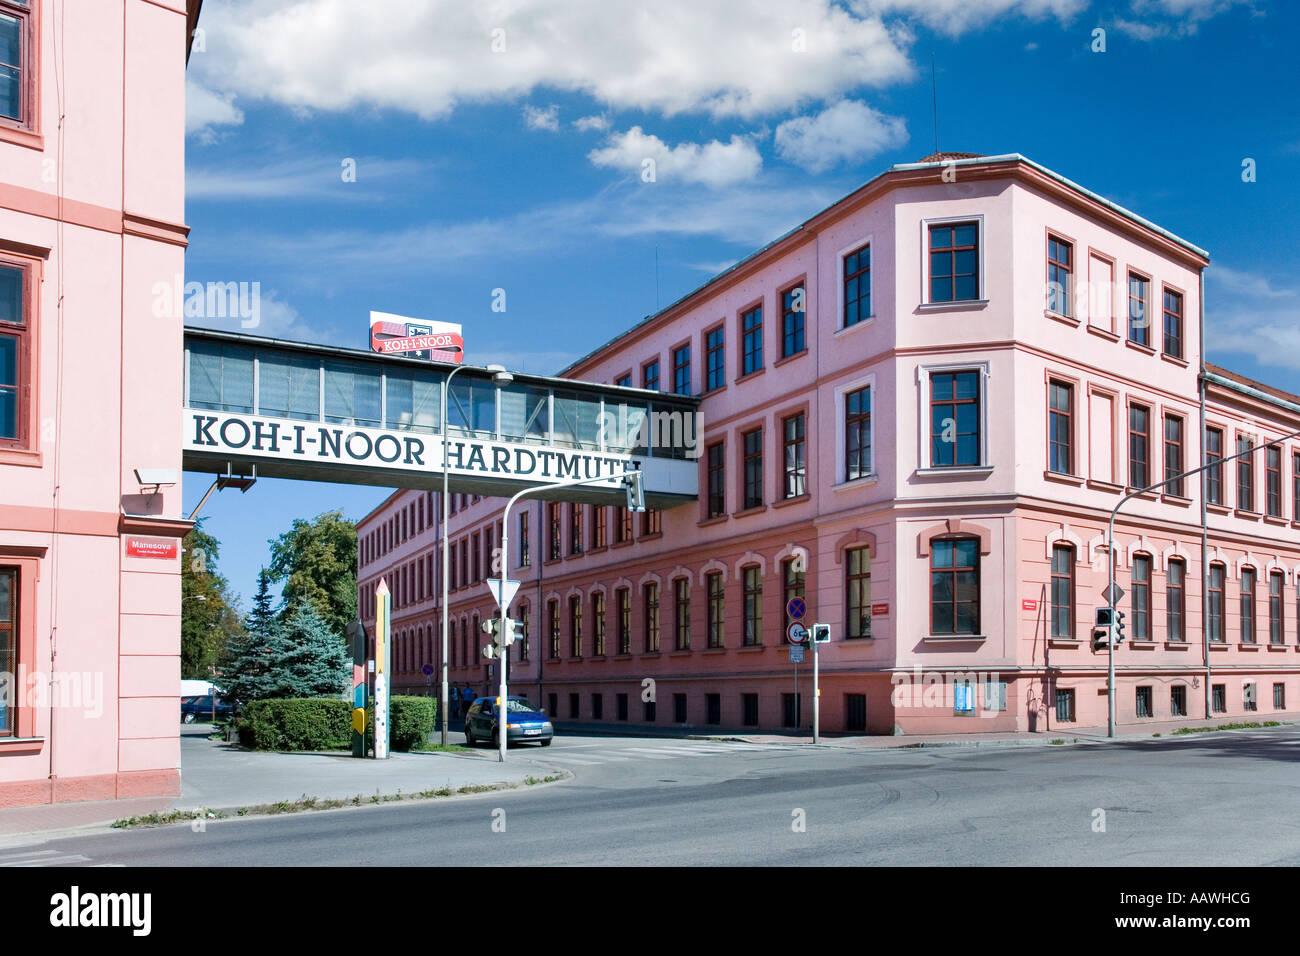 Tovarna Hardtmuth Koh i noor Ceske Budejovice Czech Republic - Stock Image